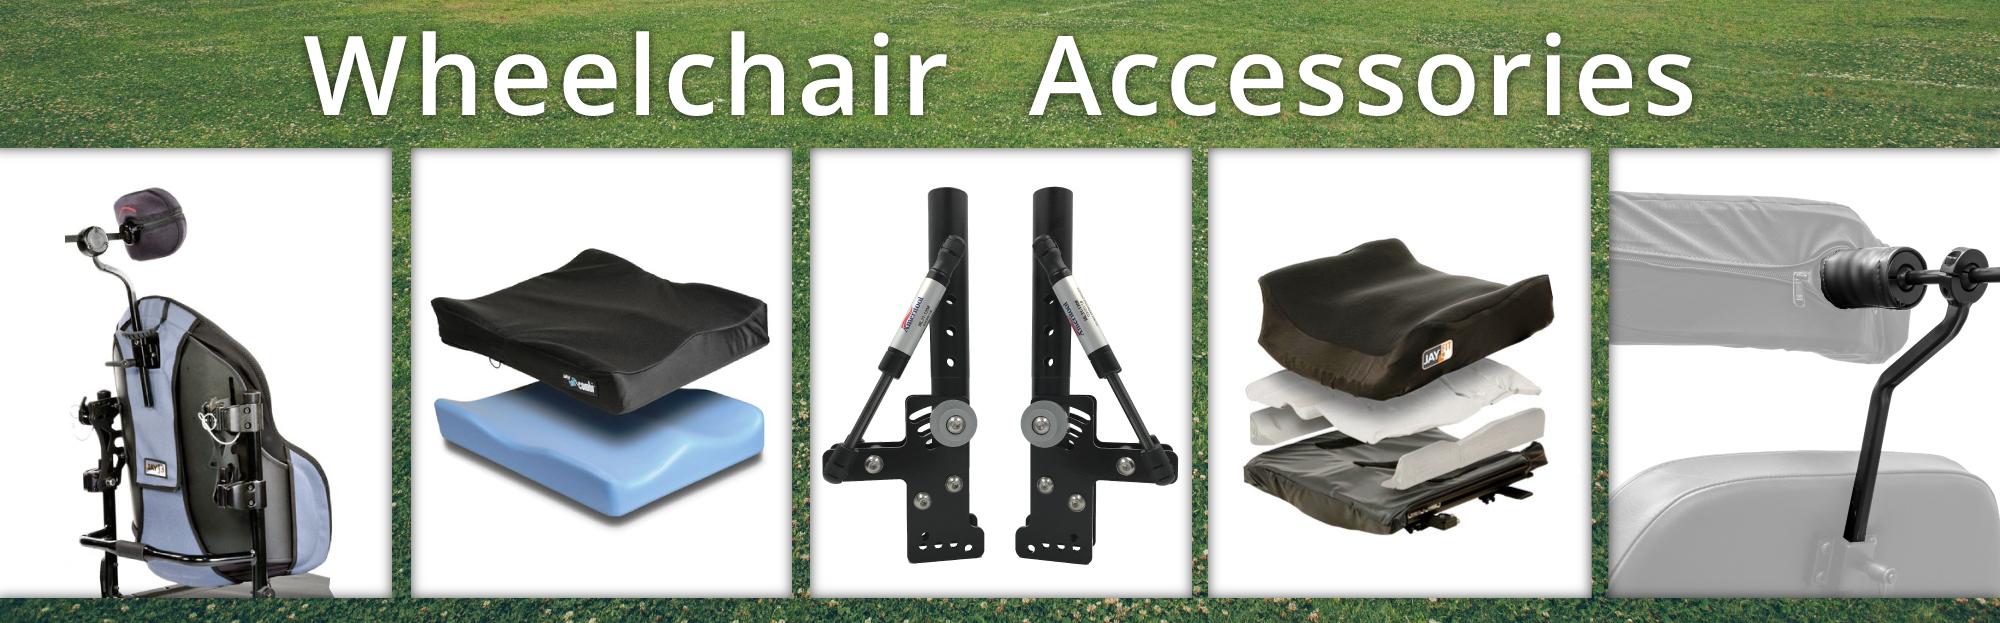 Wheelchair Accessories lineup